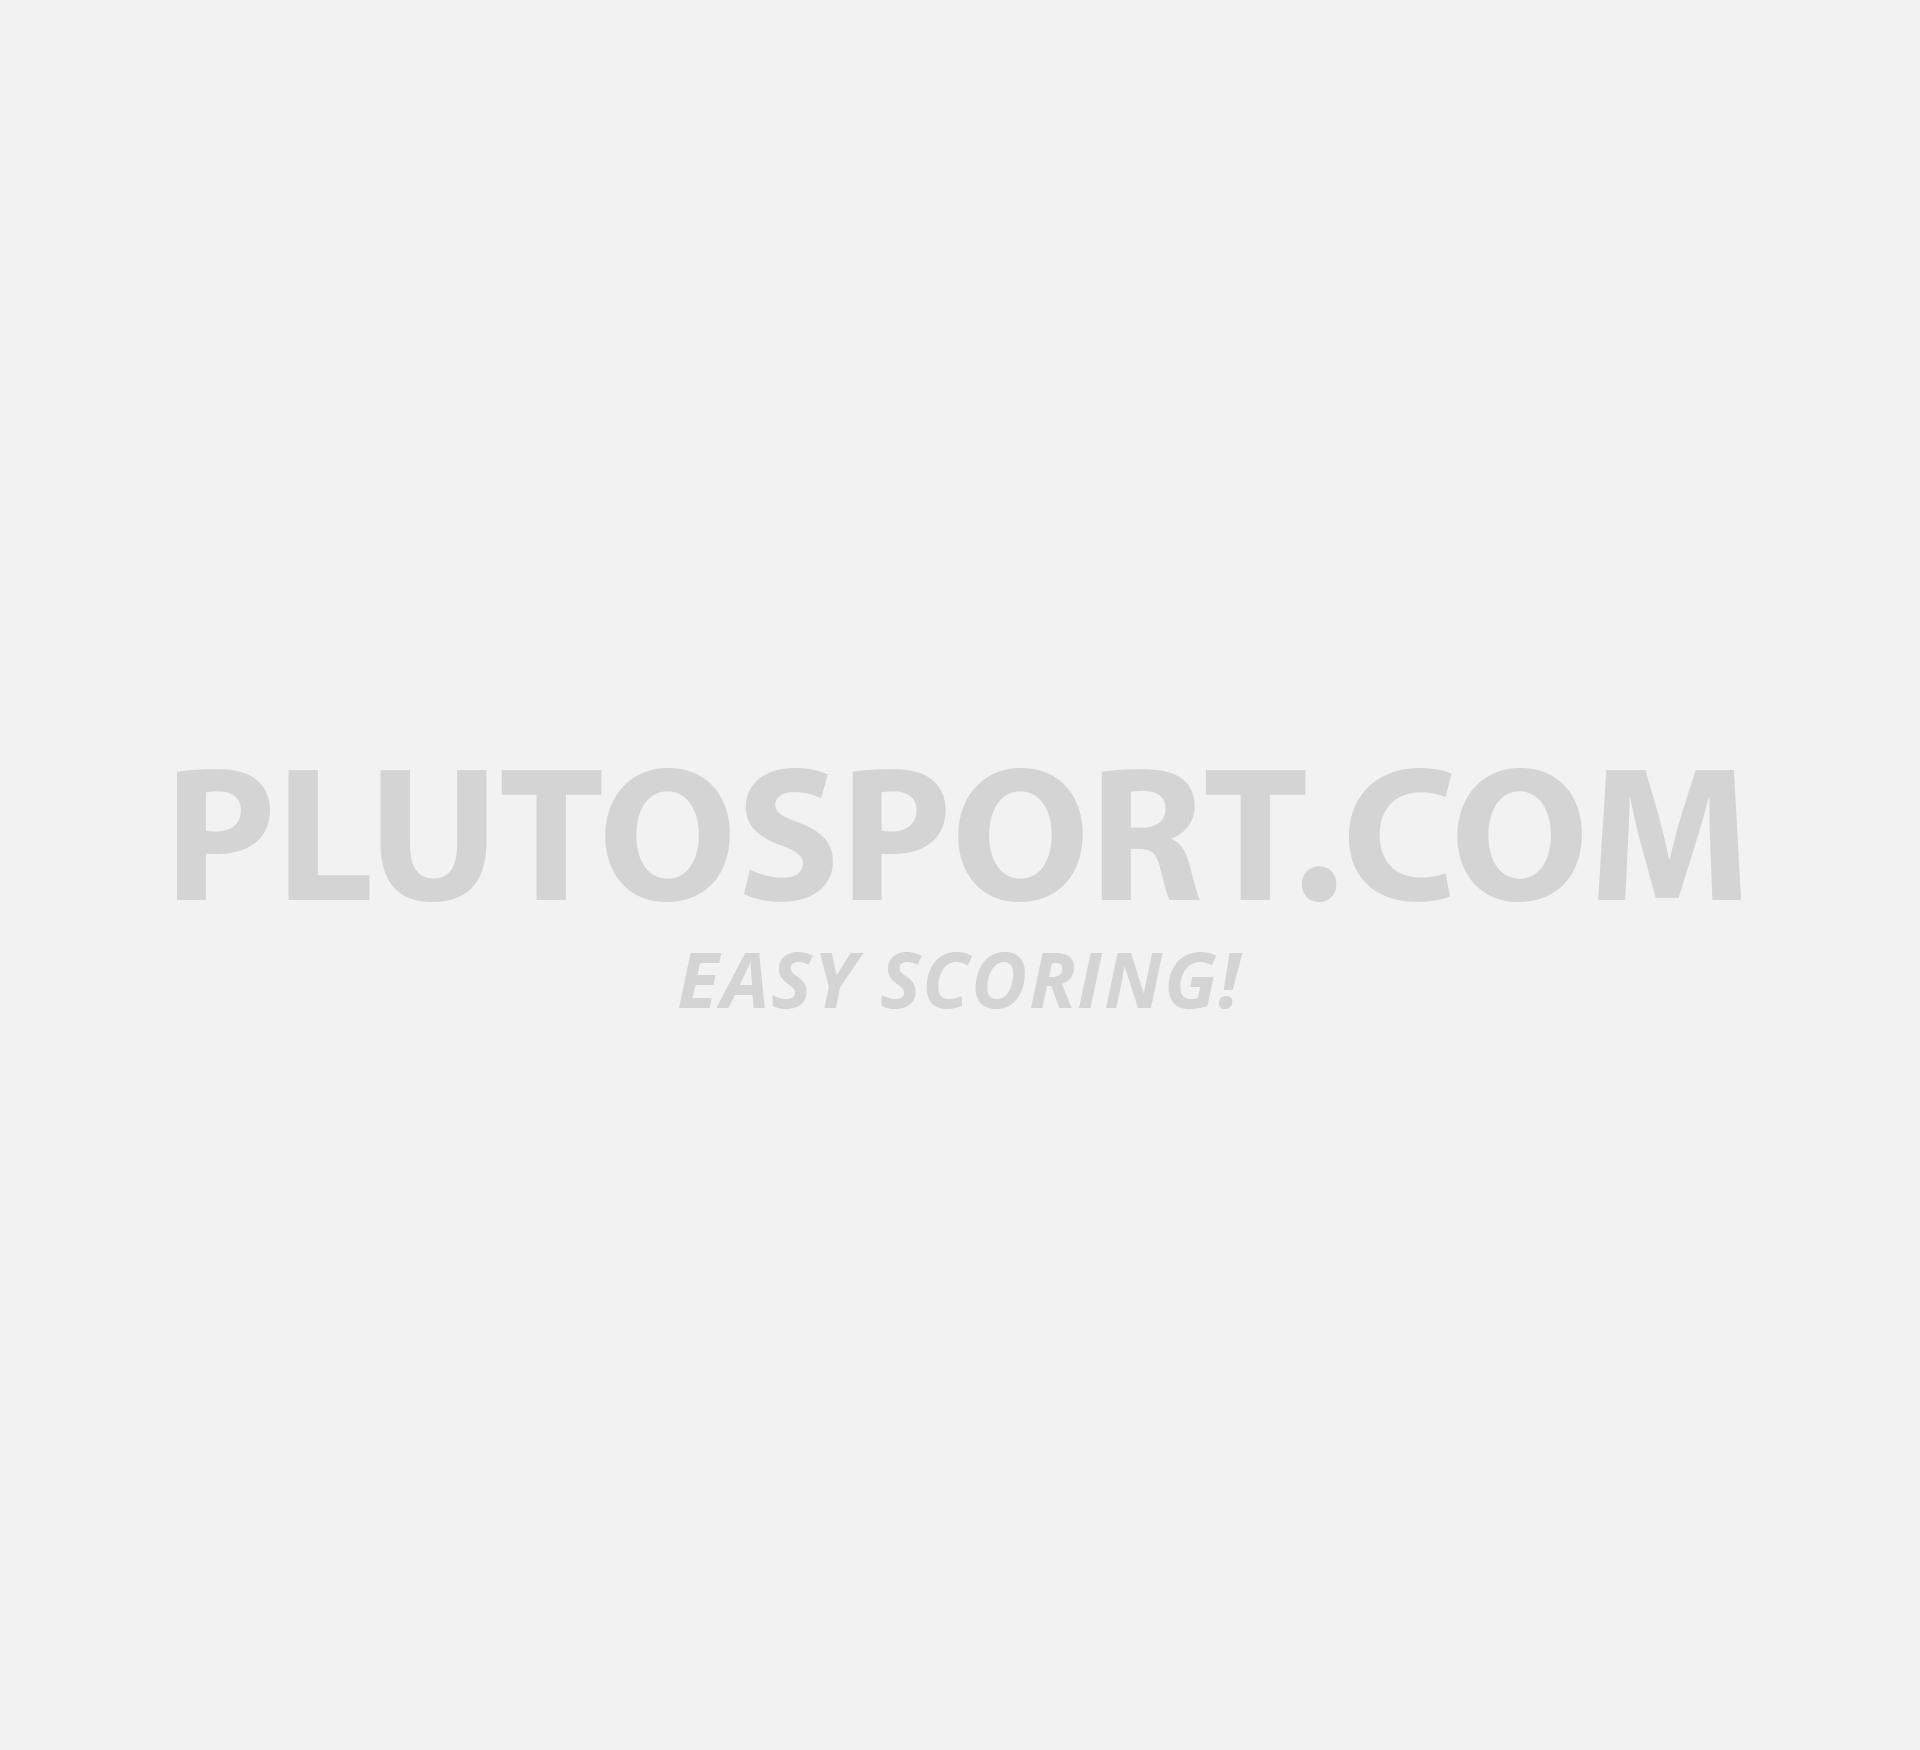 Nike Dri-Fit Running Head Band   Gloves Set Men - Gloves - Accessories -  Running - Sports  3d165cdb8be5